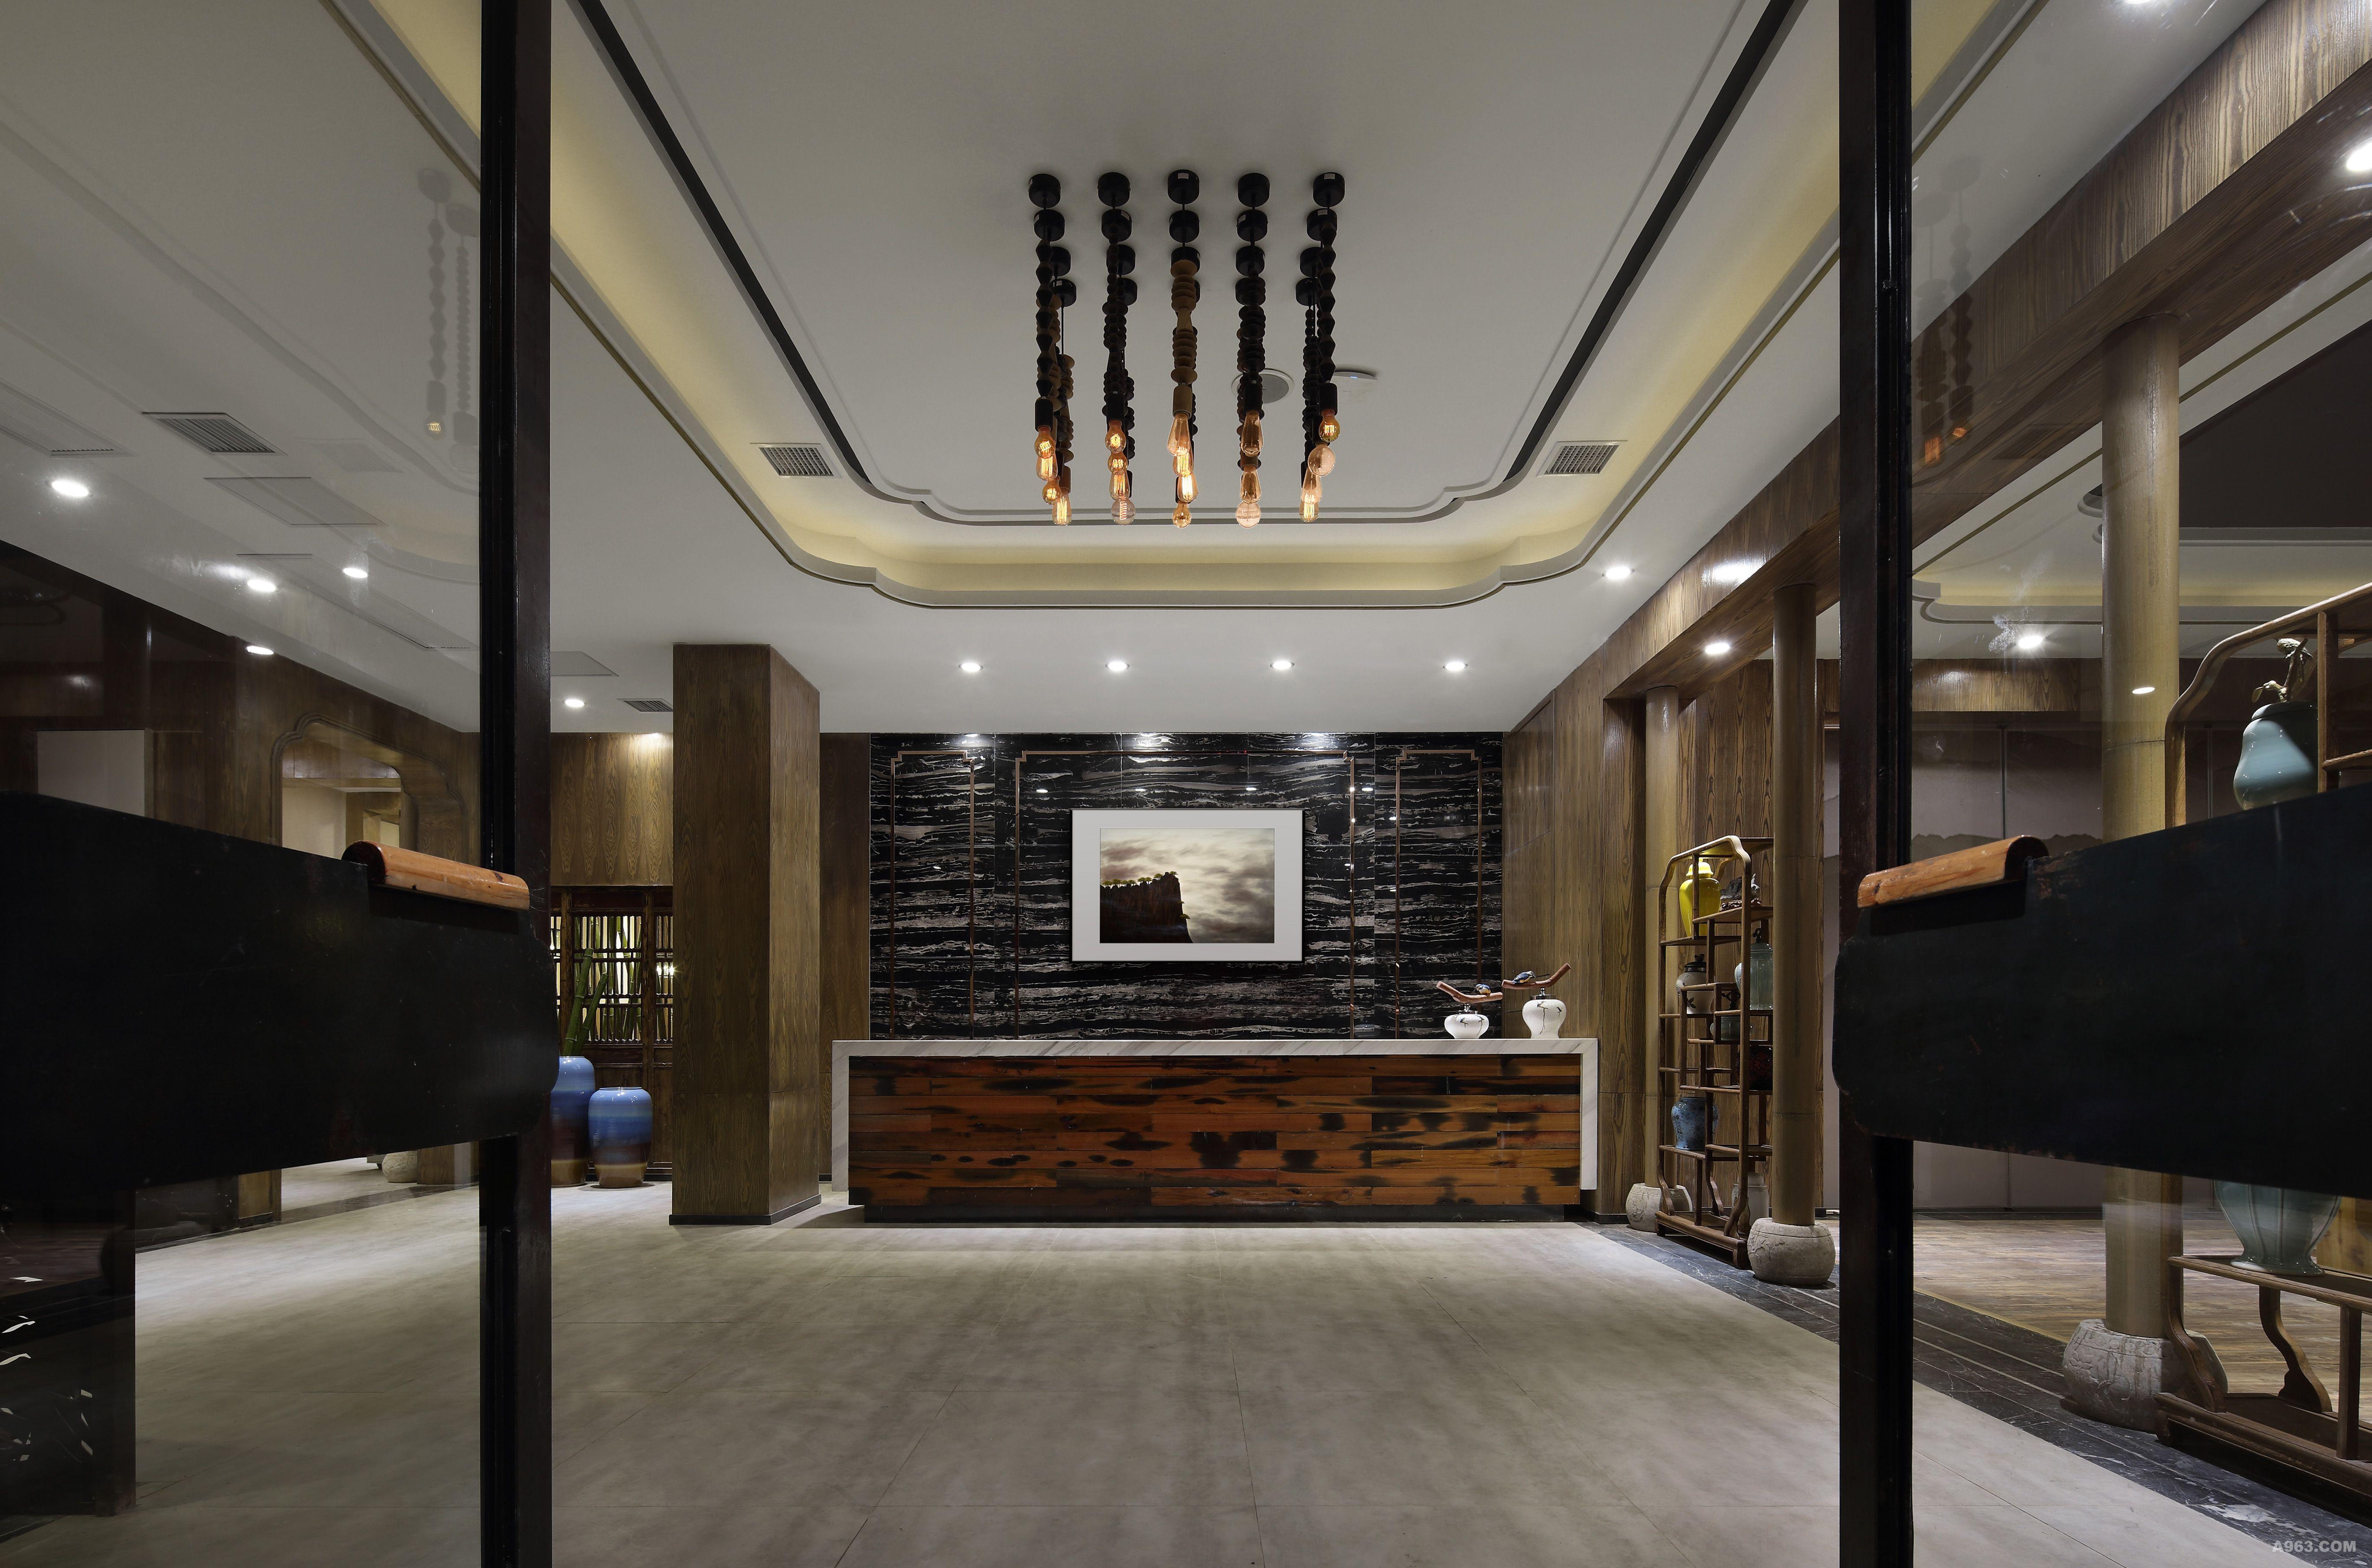 ftf建筑室内设计事务所蚌埠公司